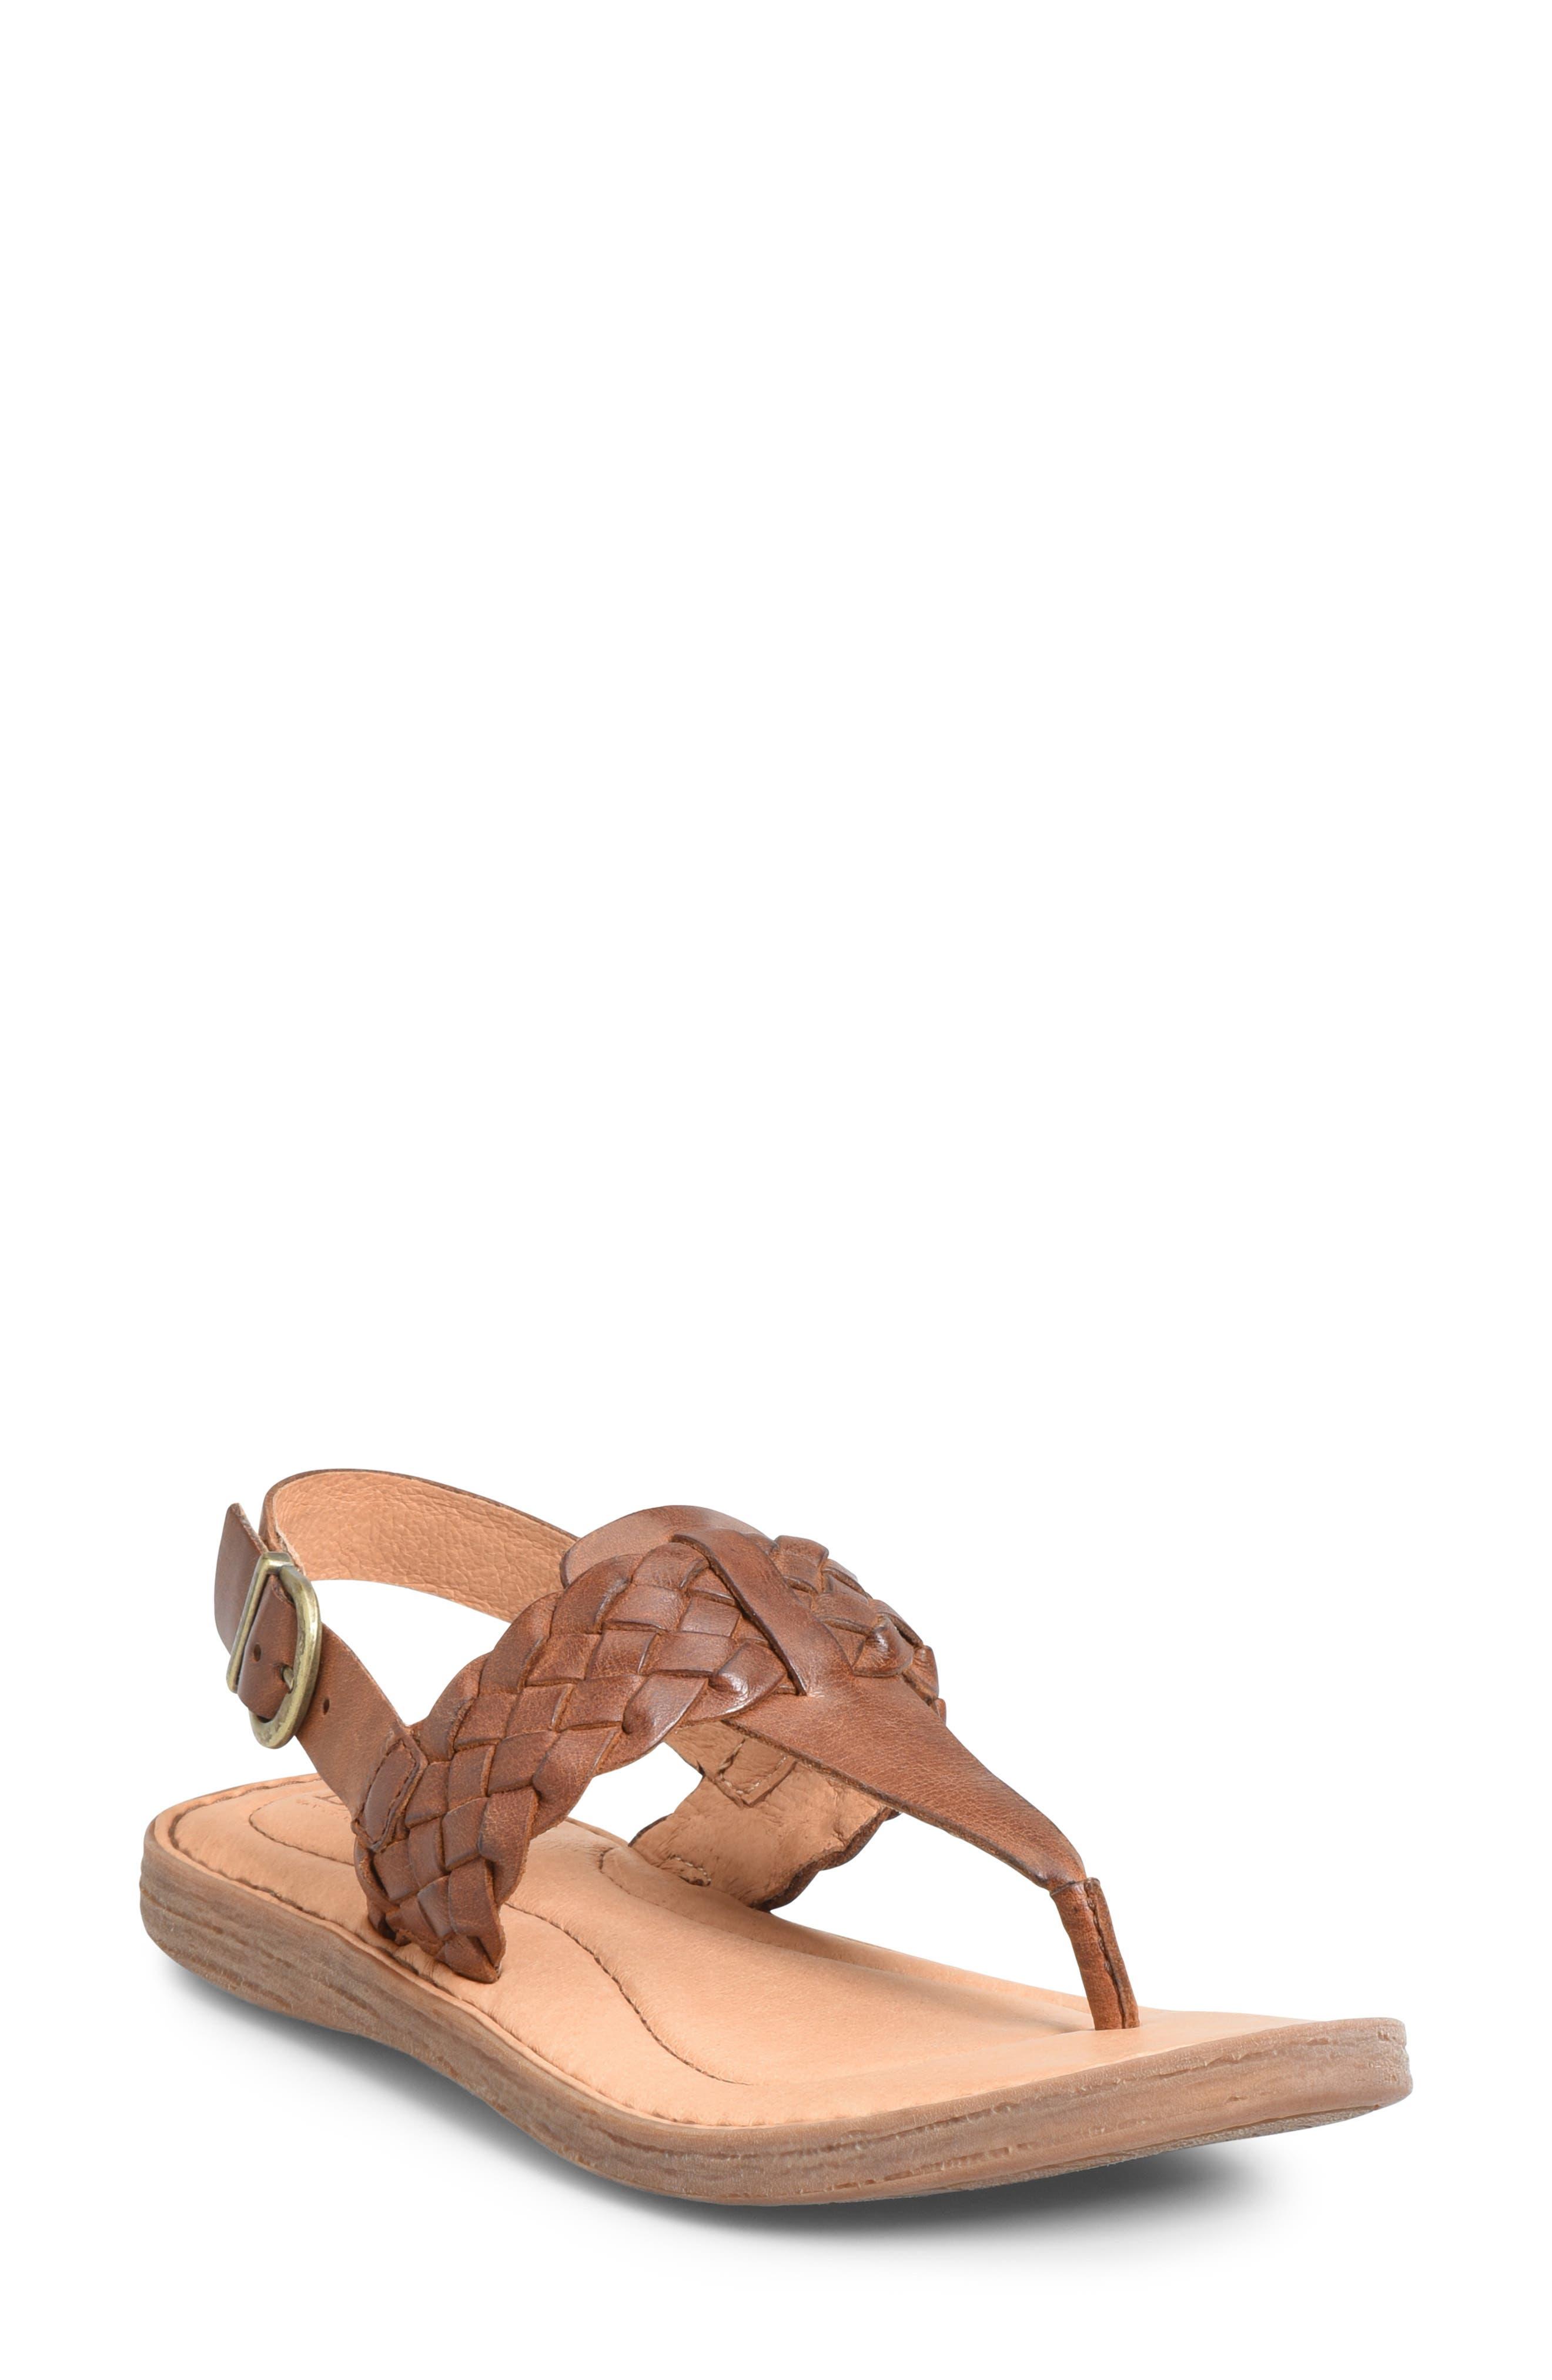 B?rn Sumter Braided Sandal, Brown